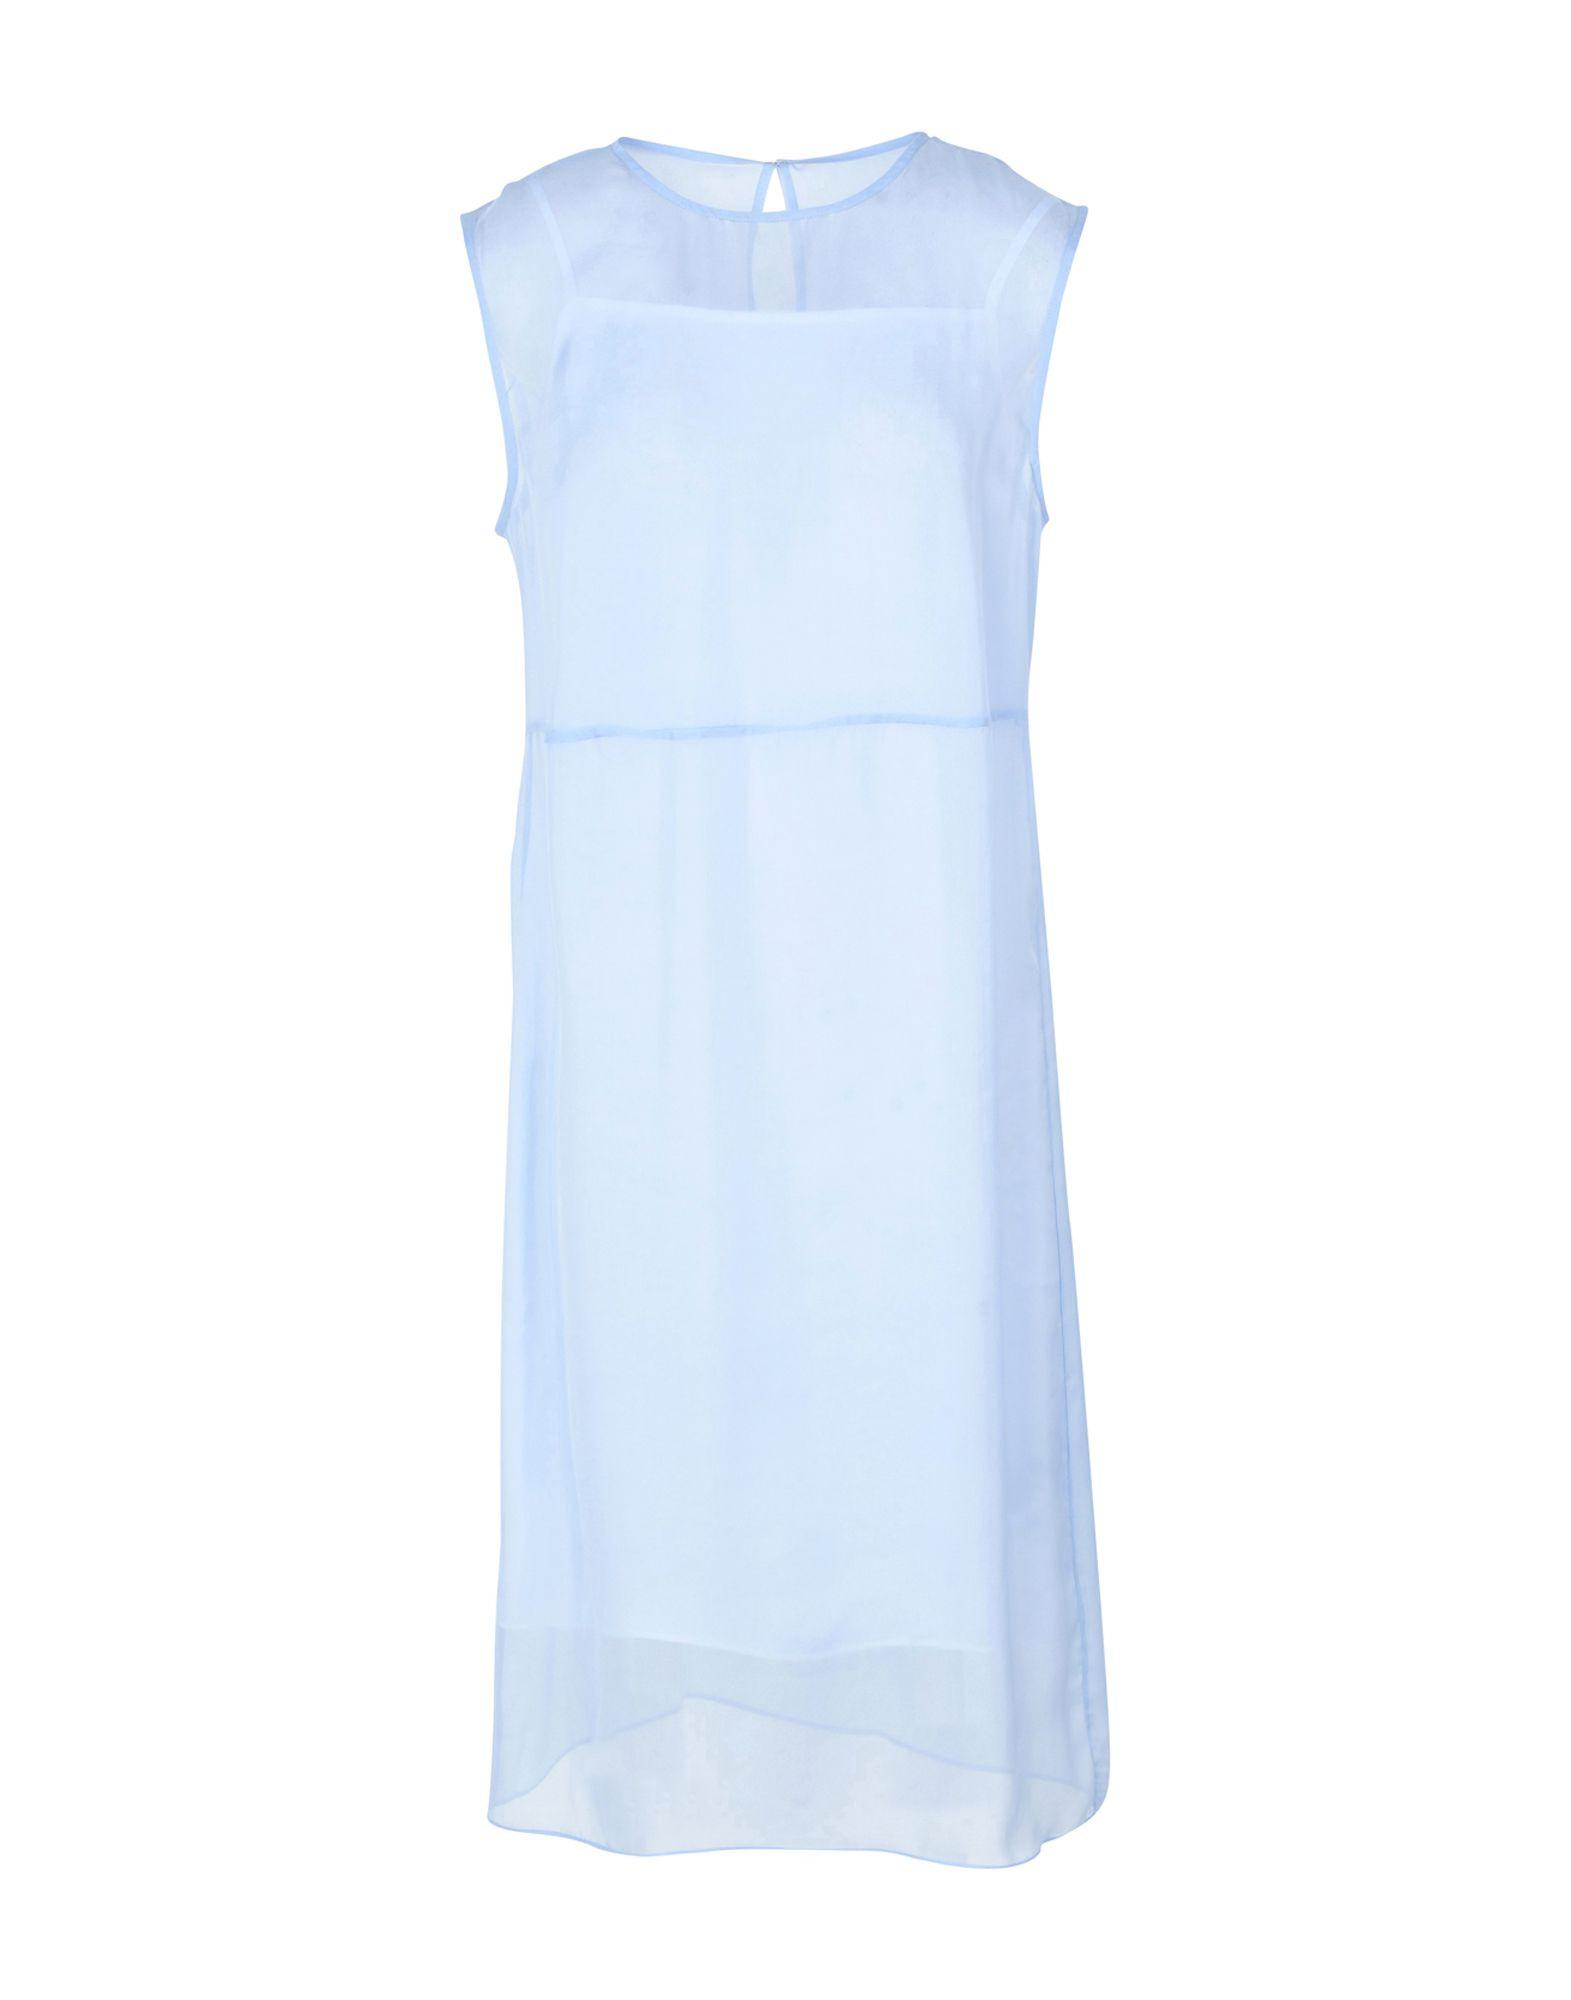 15 Cool Abendkleid Yoox Vertrieb13 Perfekt Abendkleid Yoox für 2019